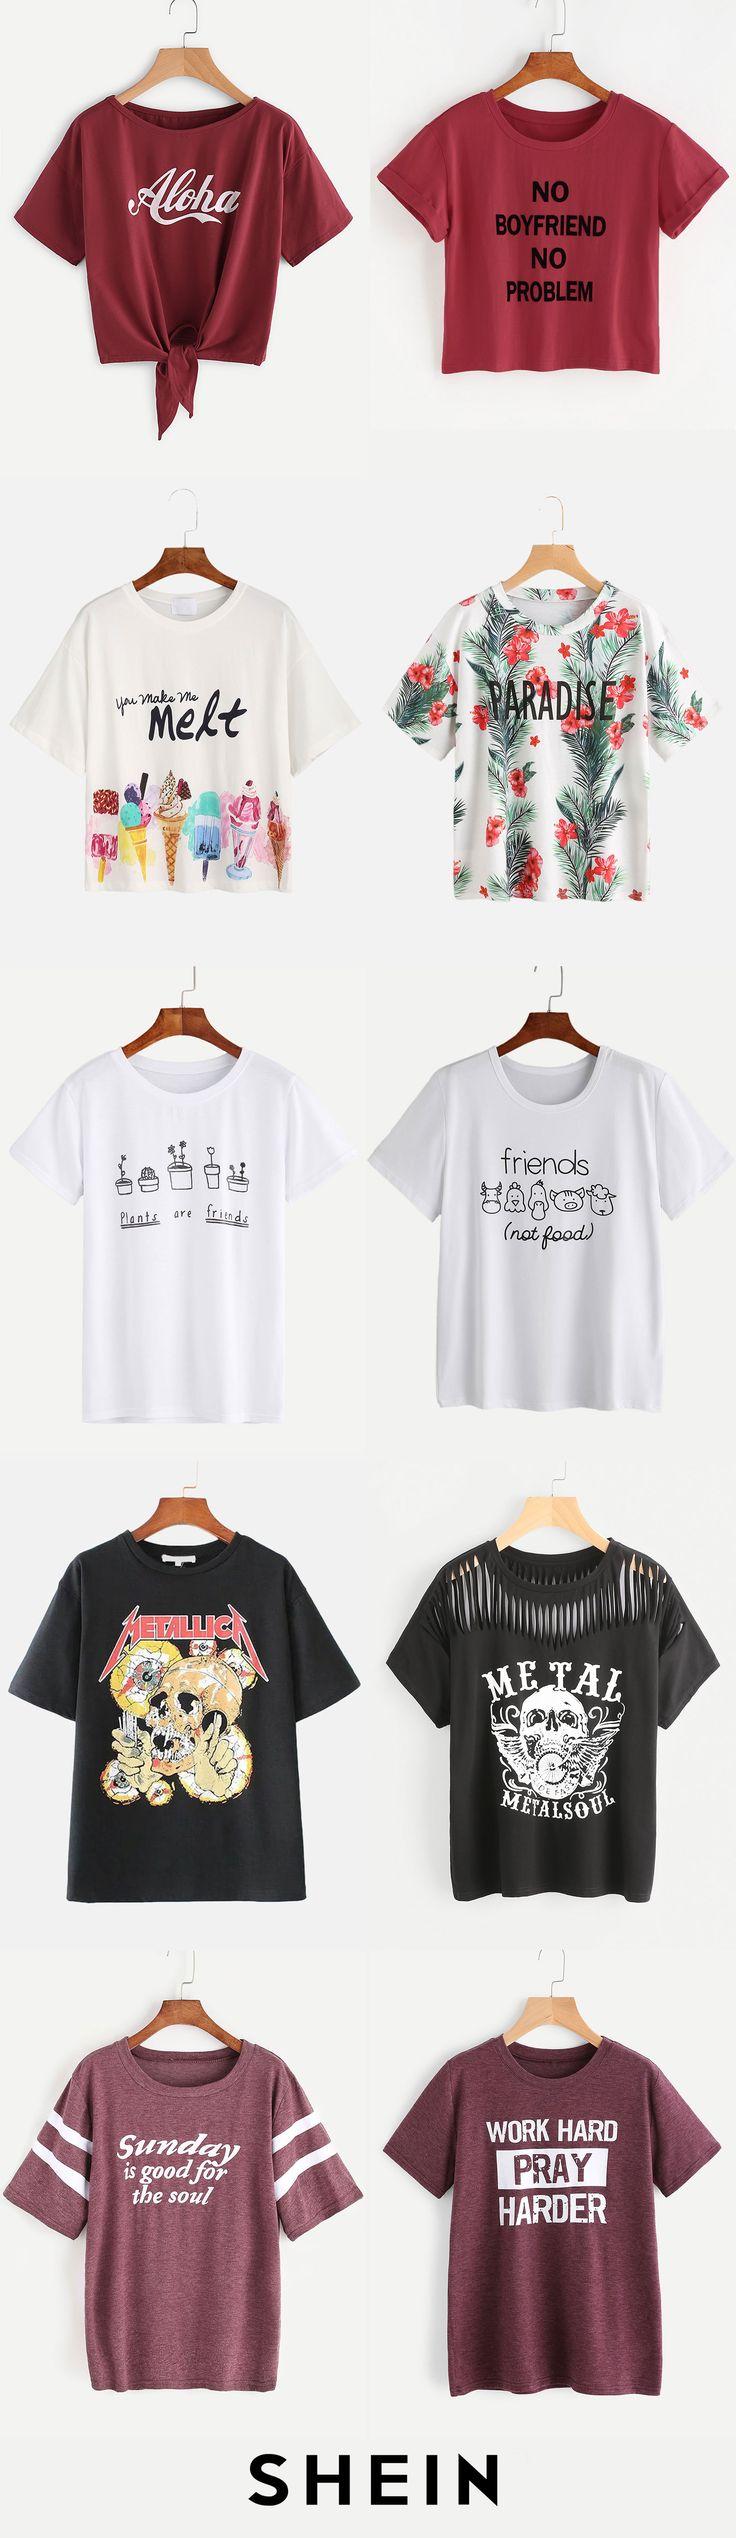 Slogan T-shirts